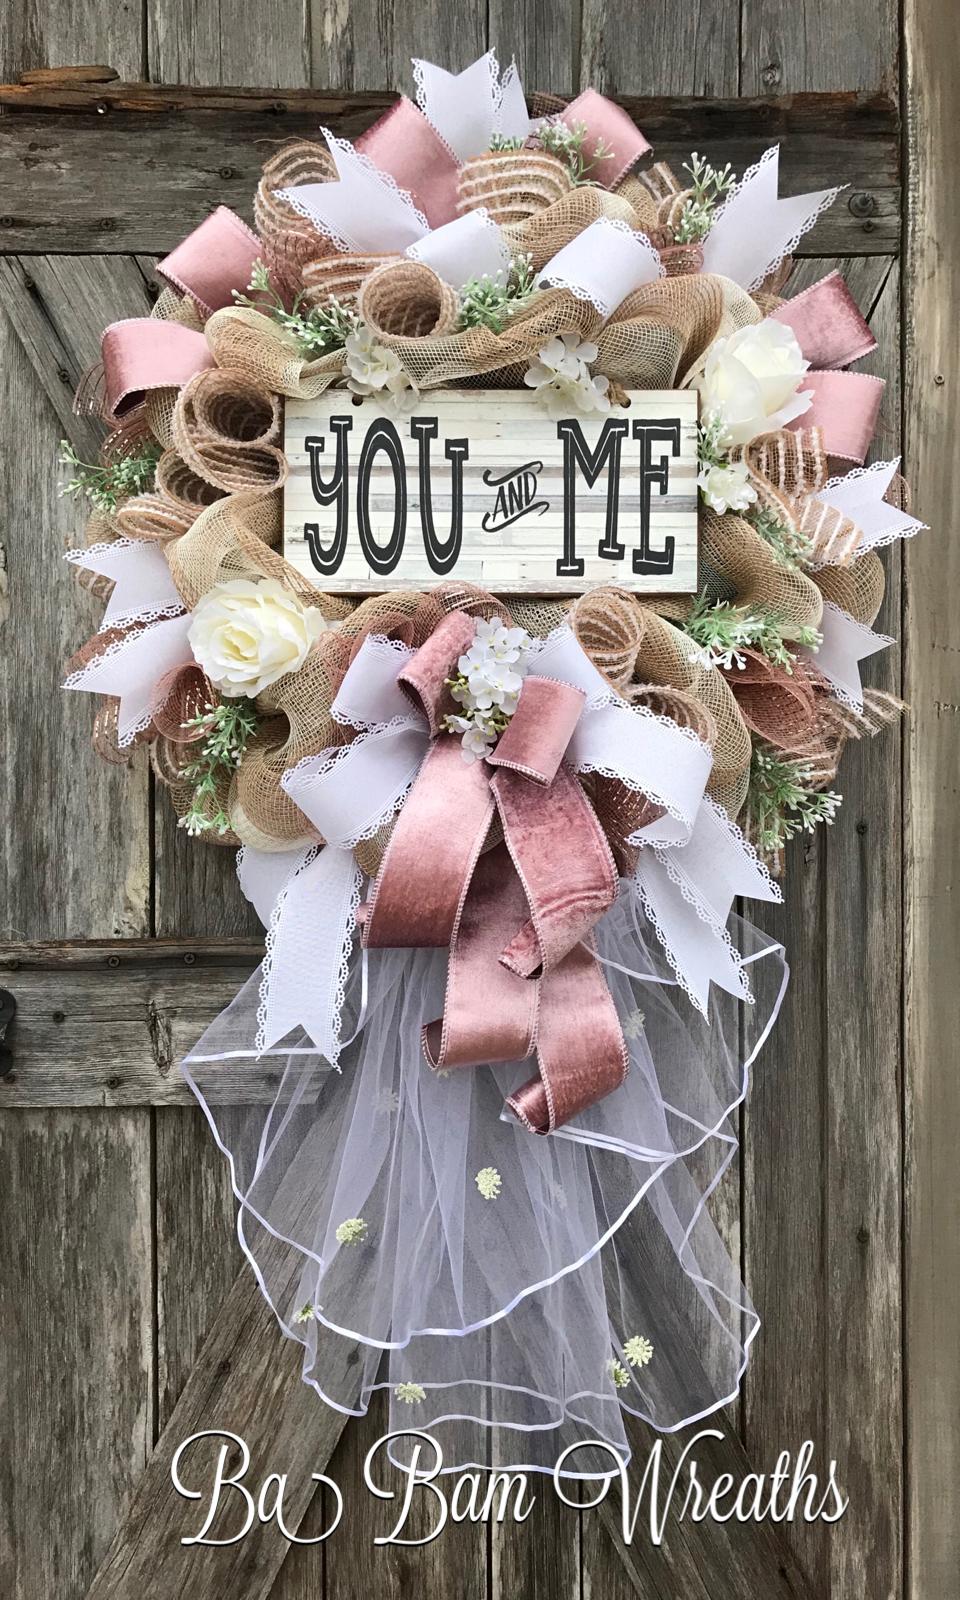 Wedding decoration png images  Wedding Wreath Wedding Decor Bridal Gift Ba Bam Wreaths  wreath